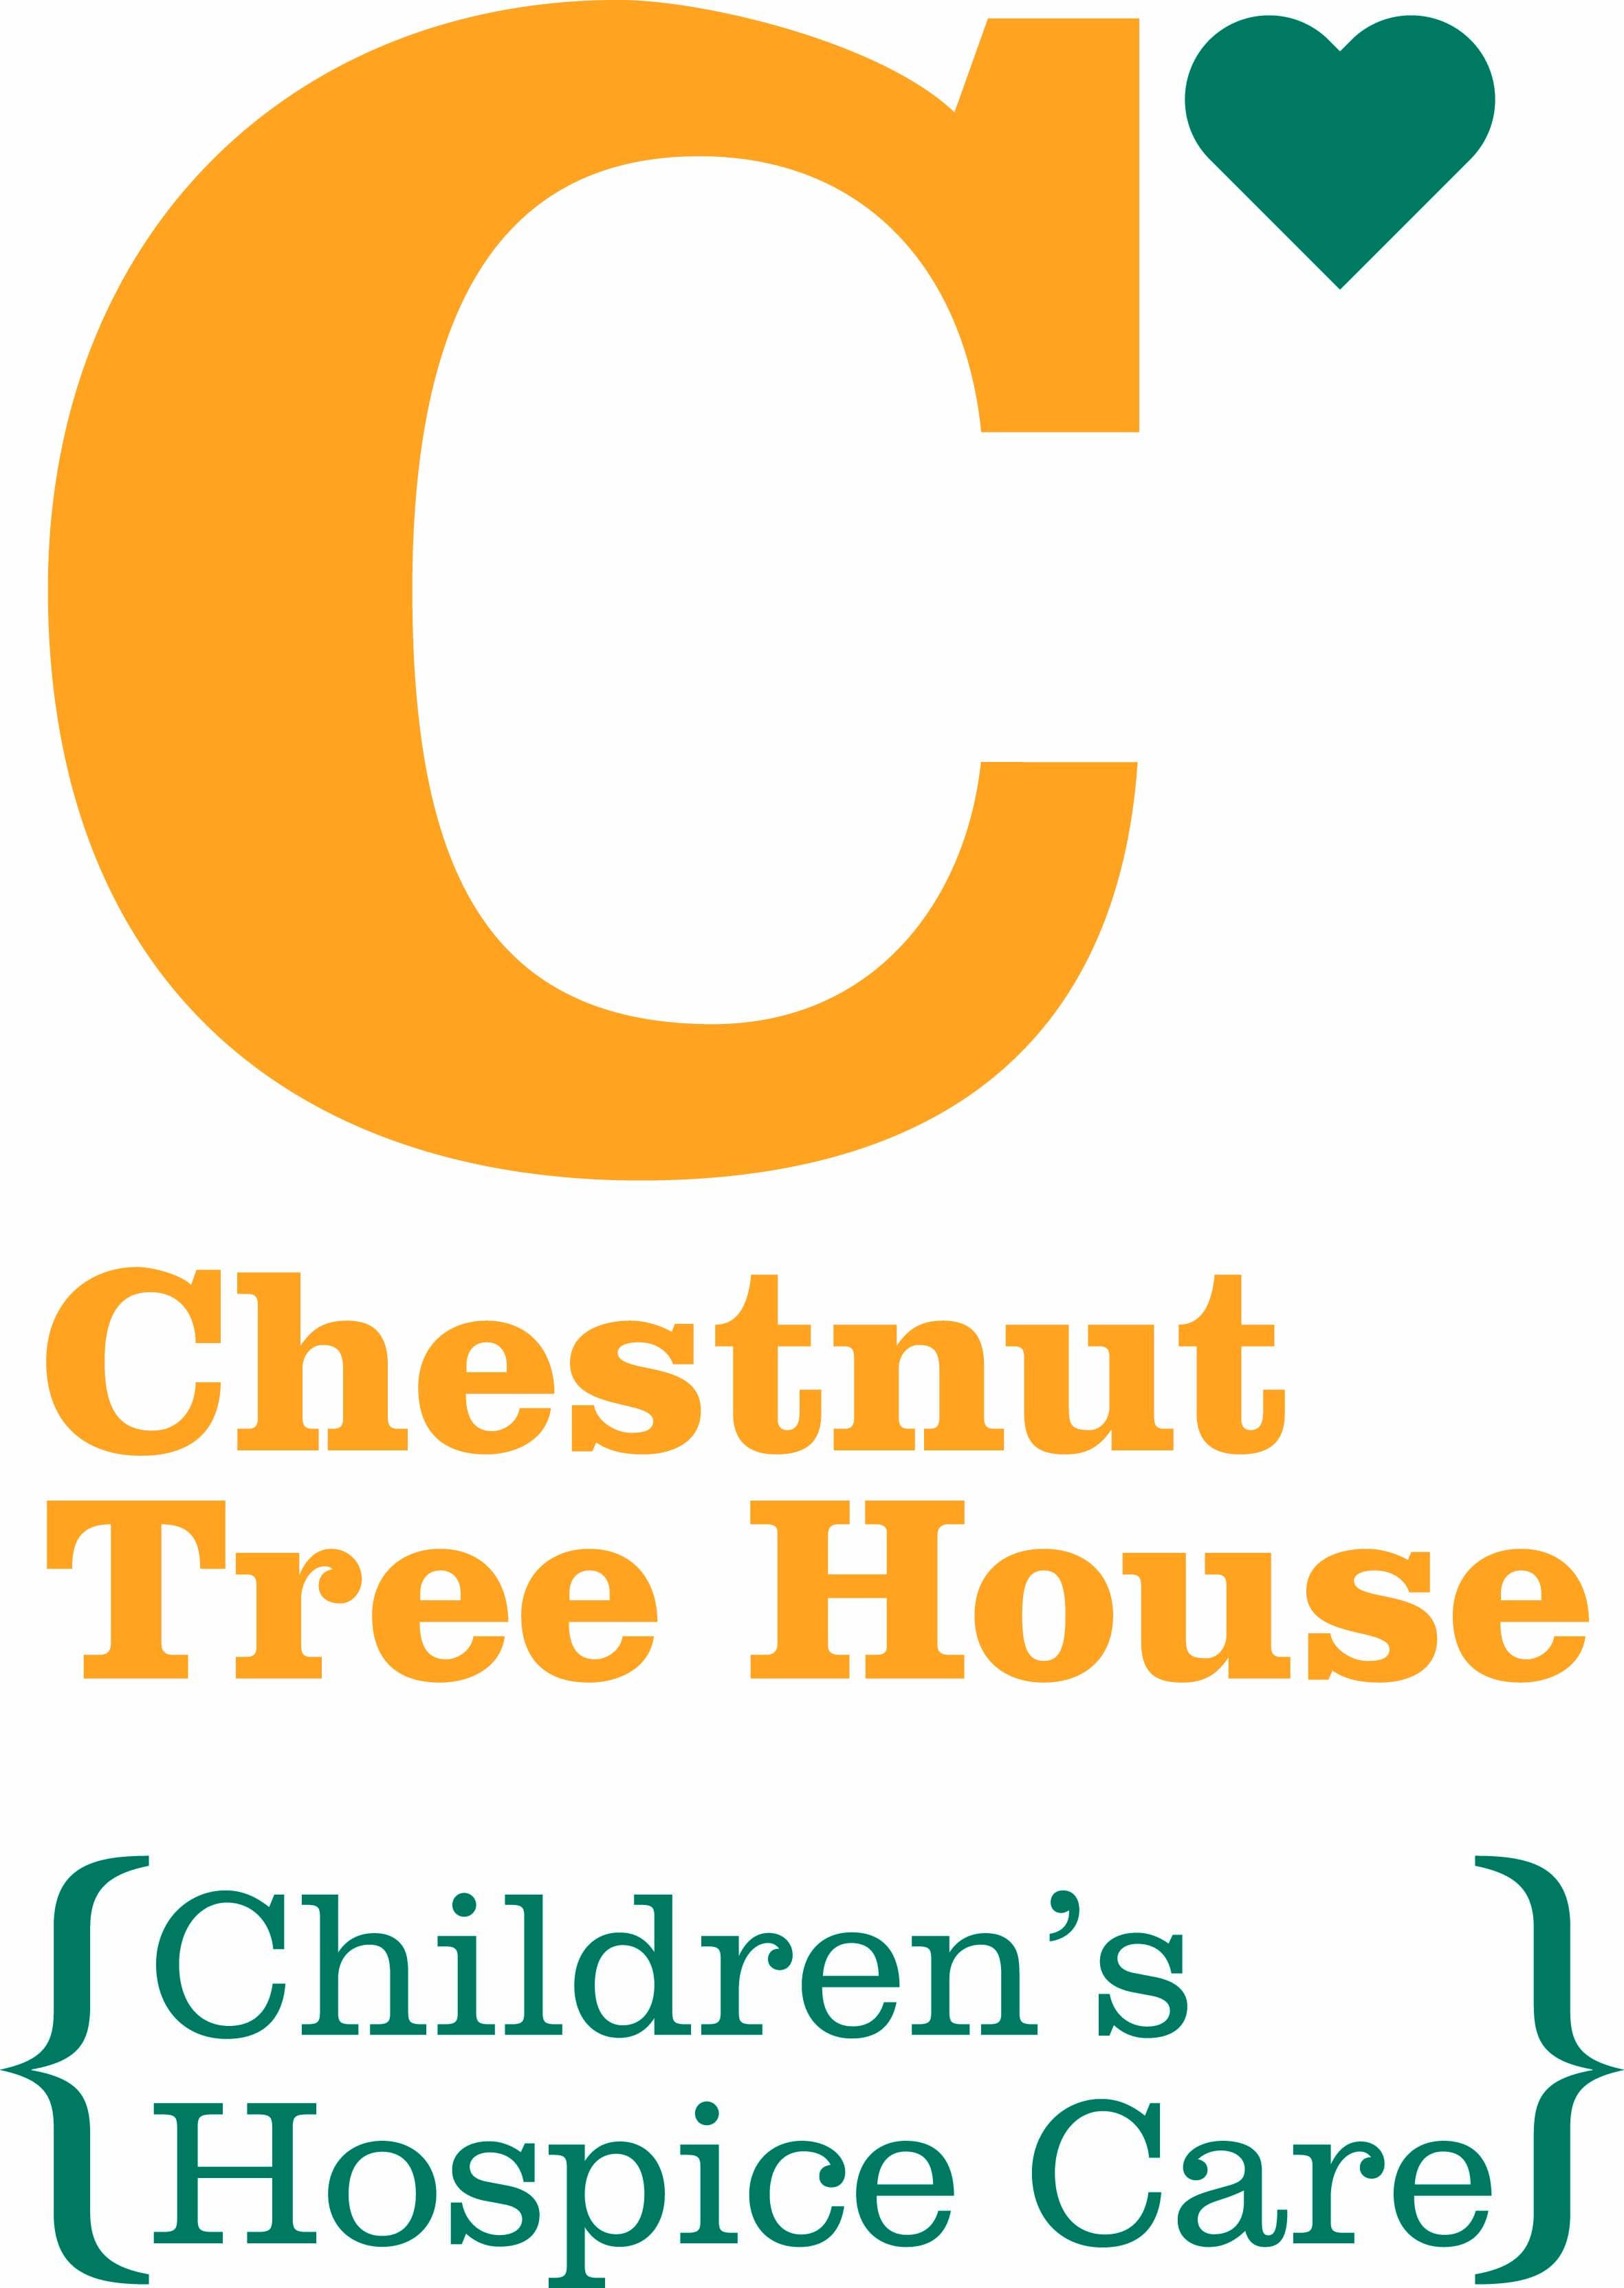 Chestnut Tree House Children's Hospice logo